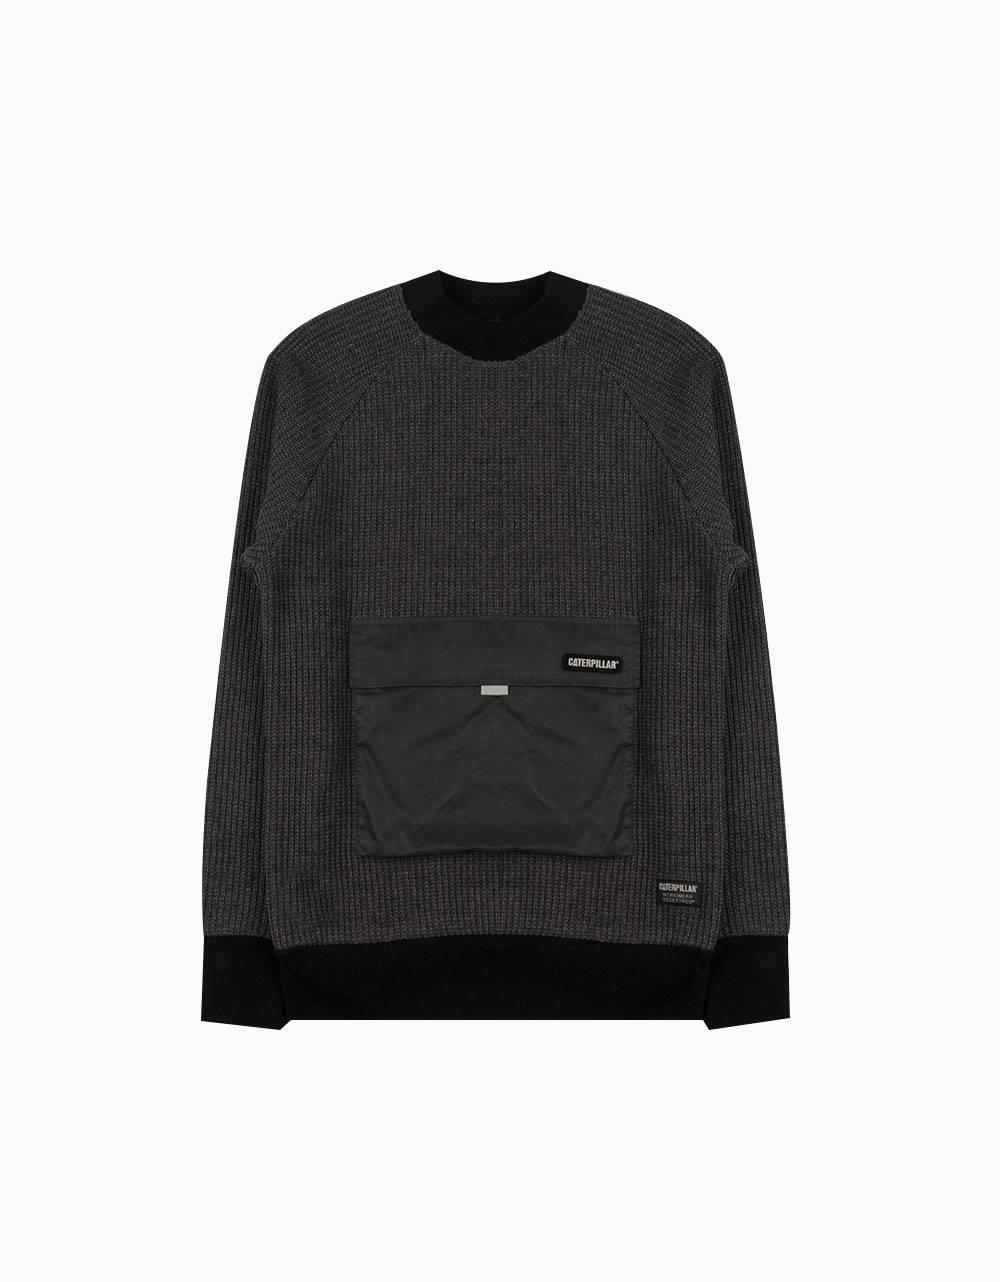 Cat Workwear Redefined Pocket knit sweater - dark grey CAT WORKWEAR REDEFINED Knitwear 102,46€